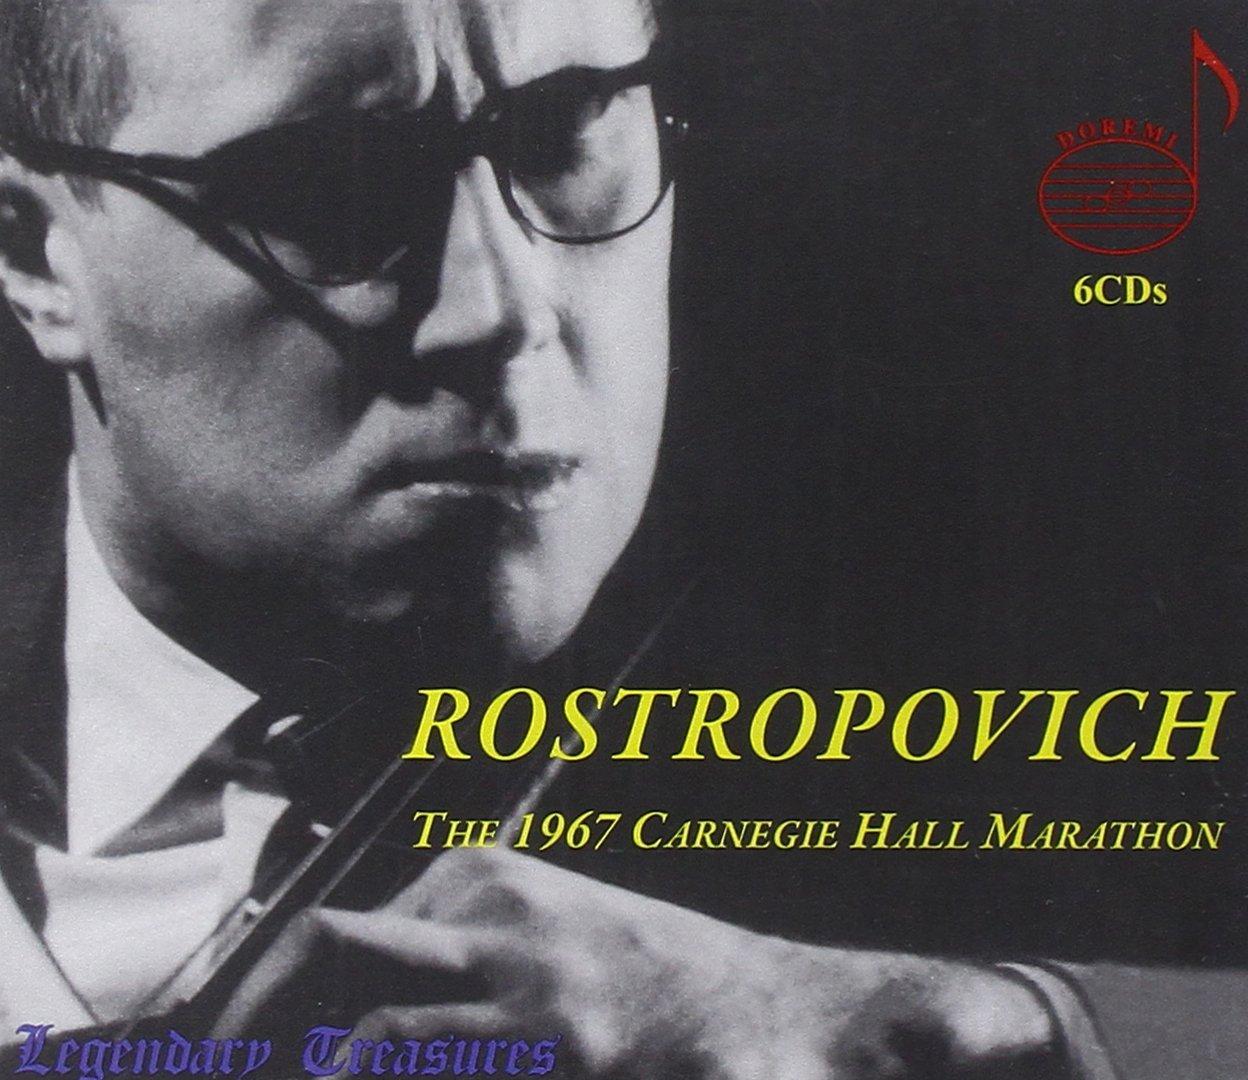 1967 Carnegie Hall Marathon (6 CDs)